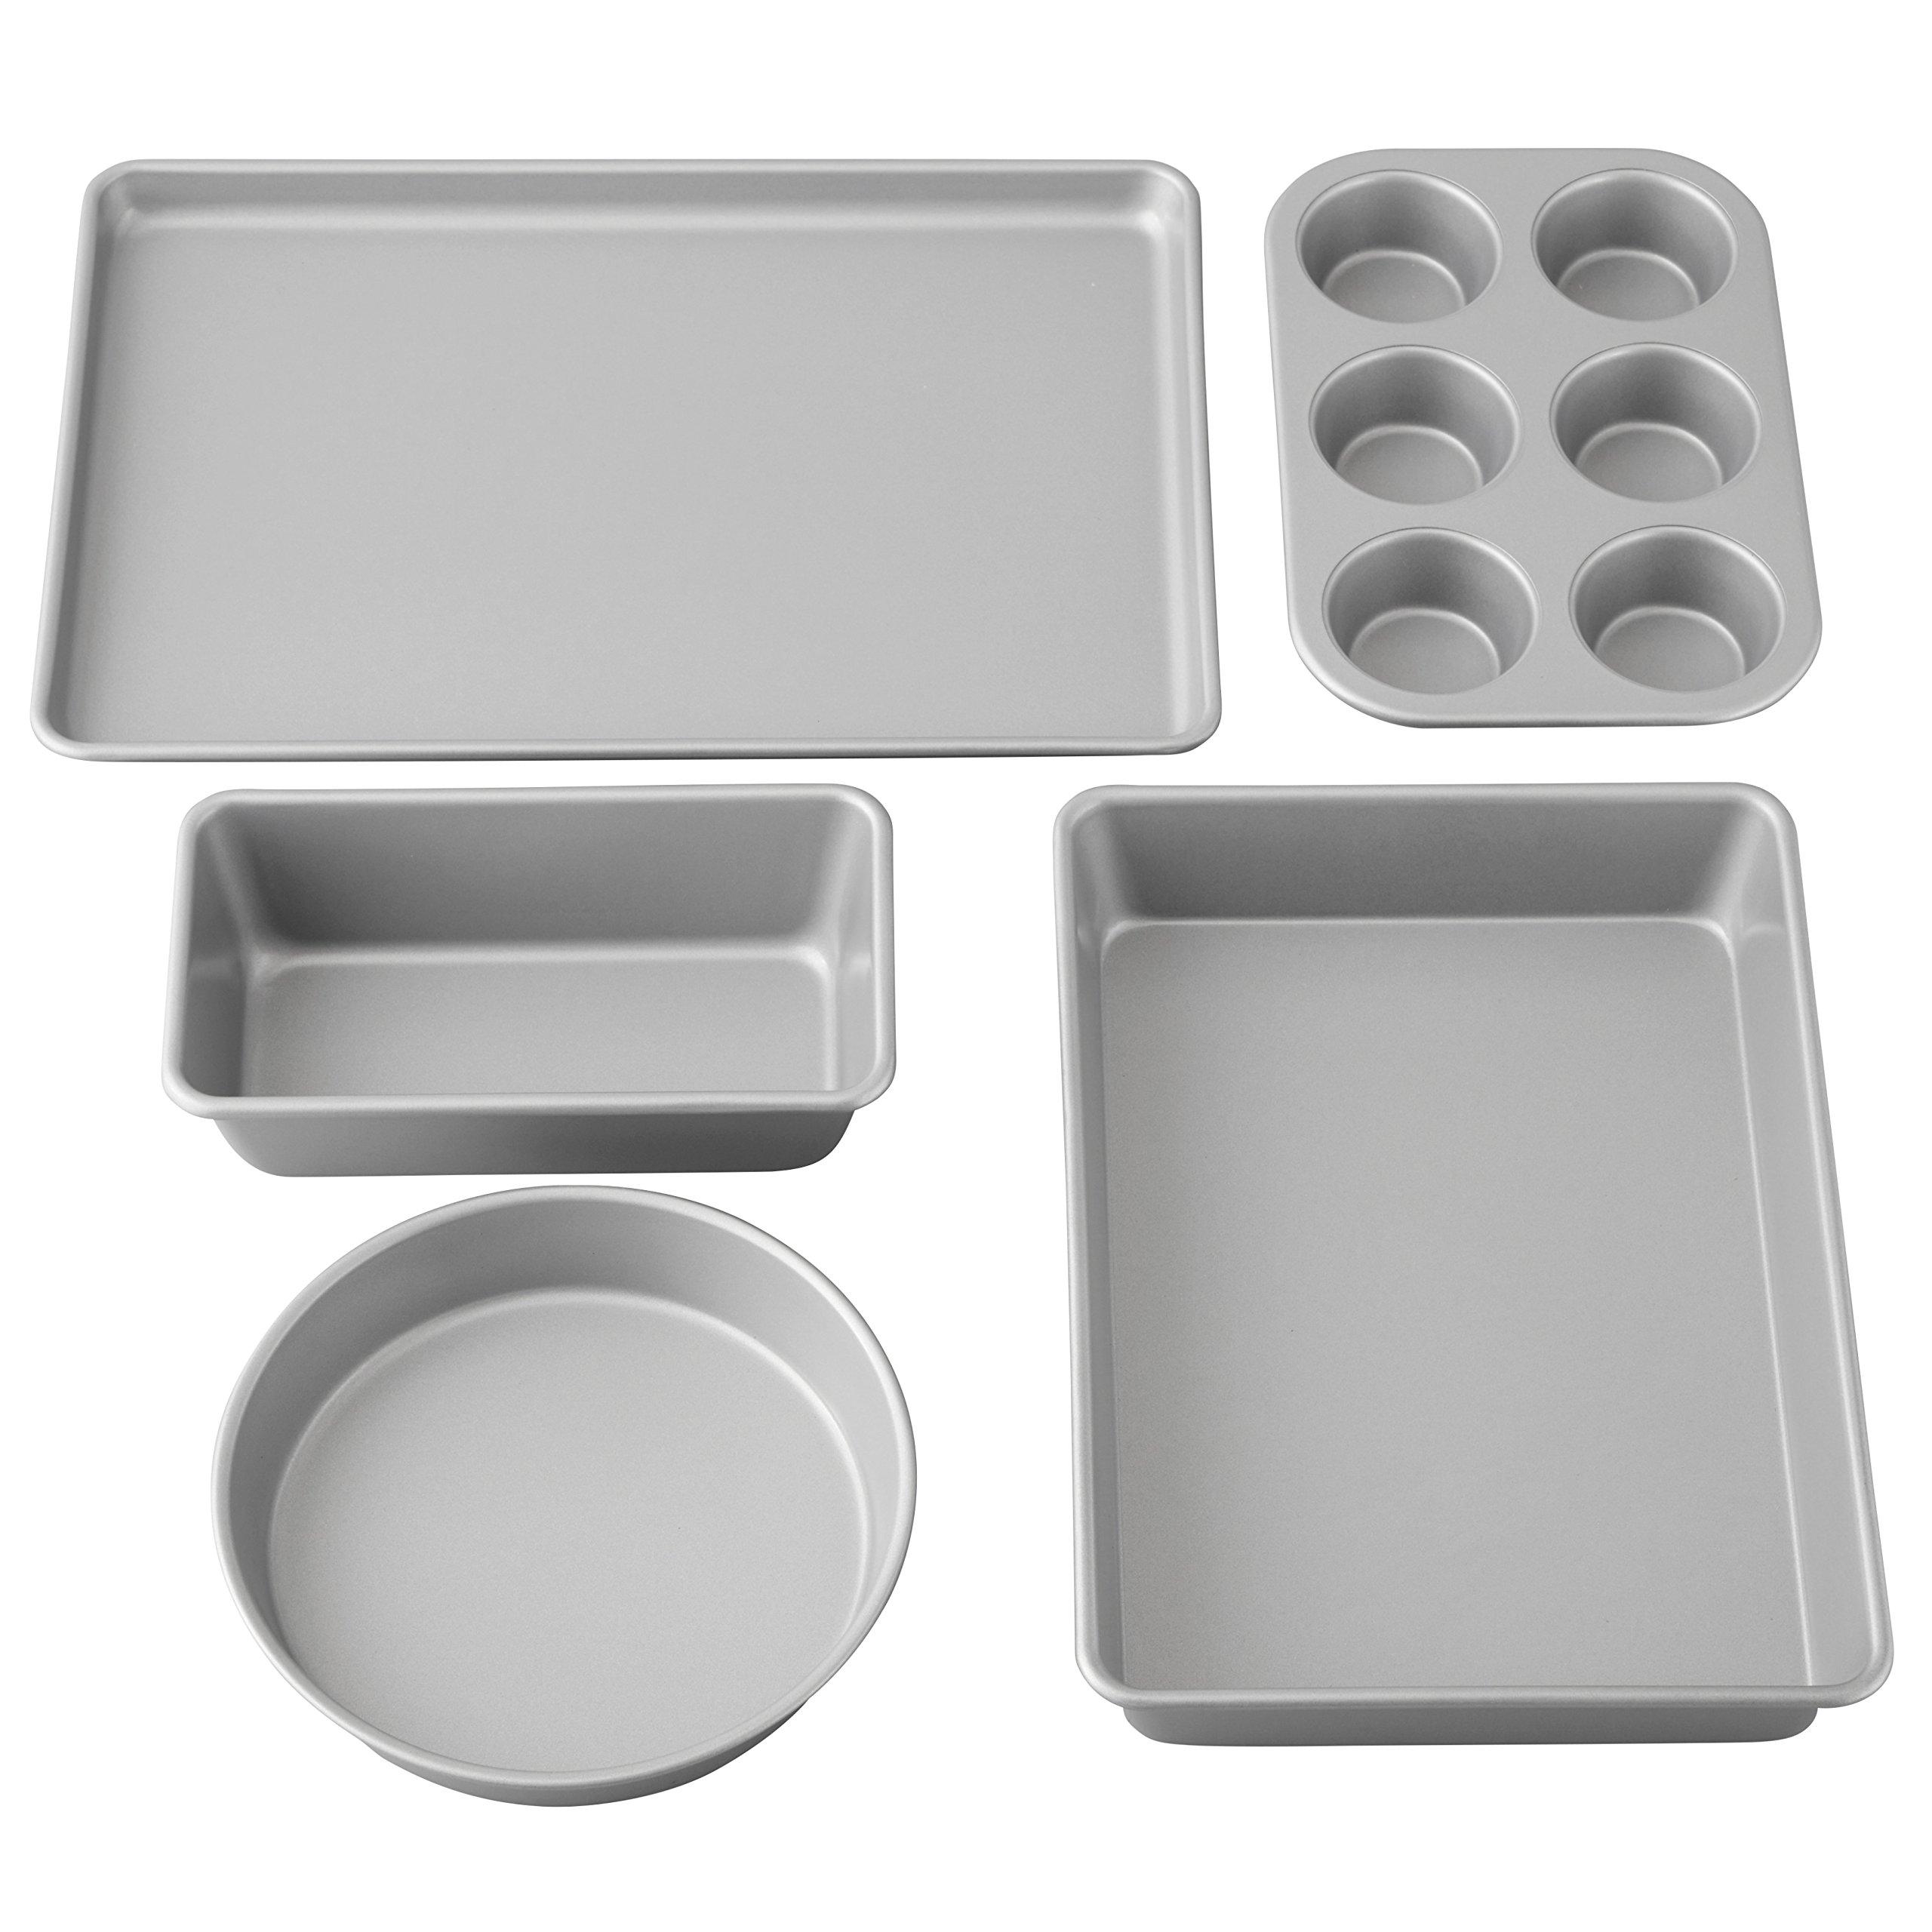 Wilton Best Value Non-Stick Baking Set, 5-Piece